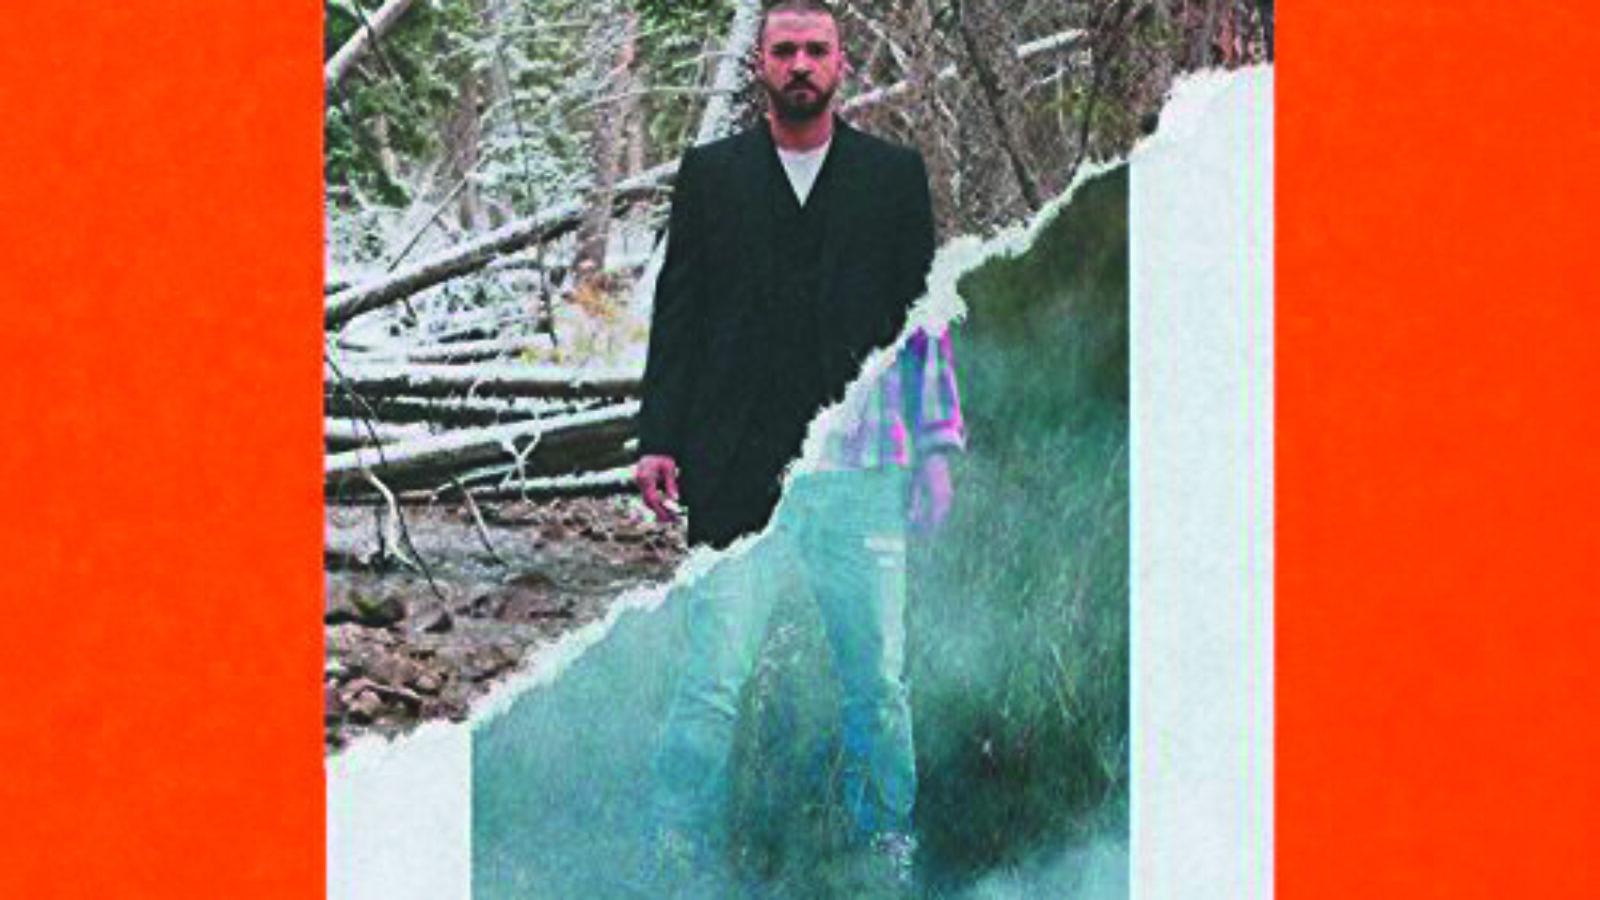 Justin Timberlake Man Of The Woods